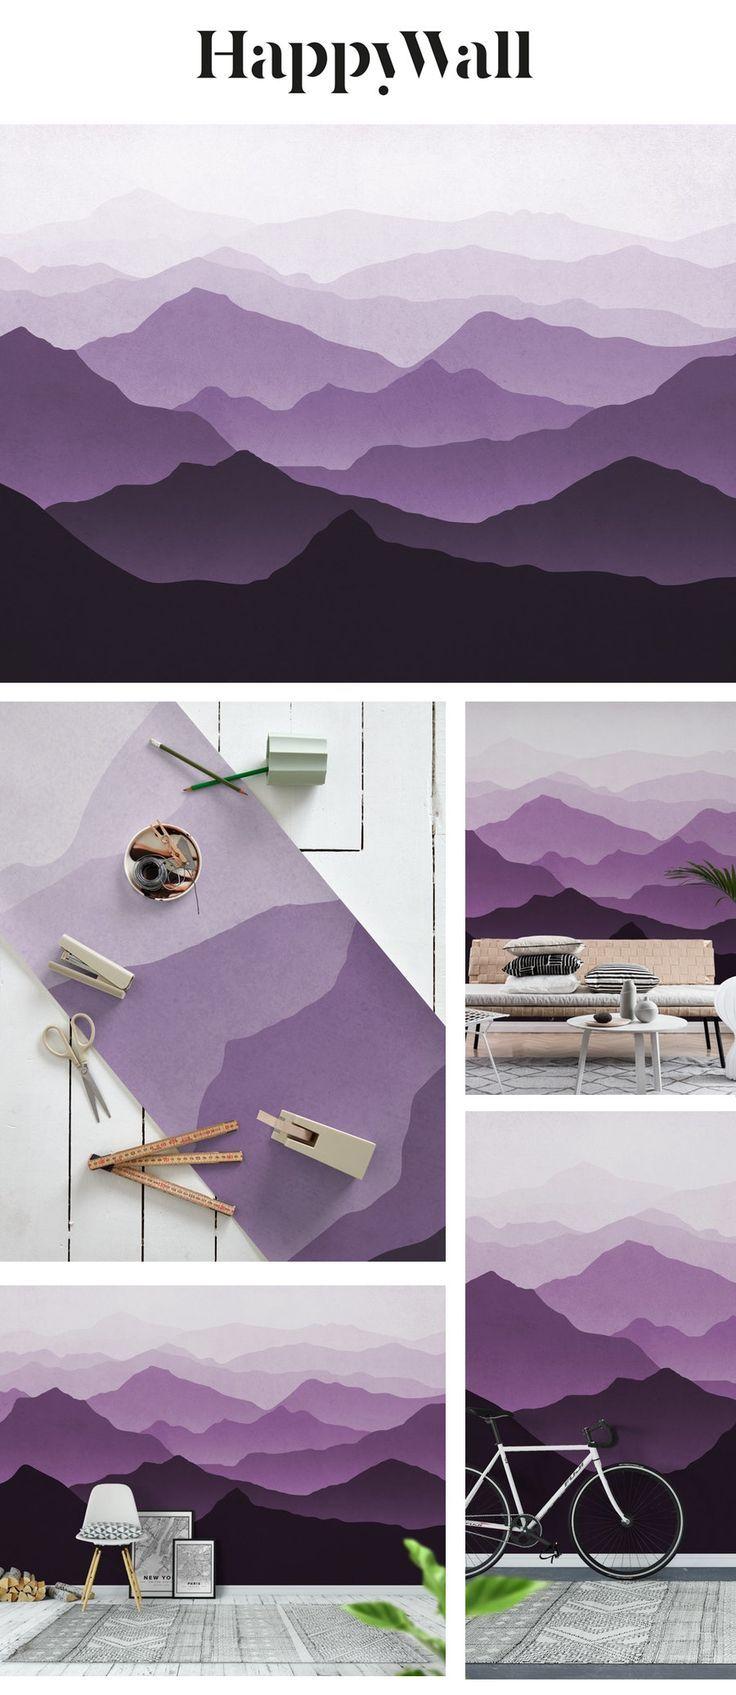 Purple mountains II Wall mural in 2020 Mountain mural